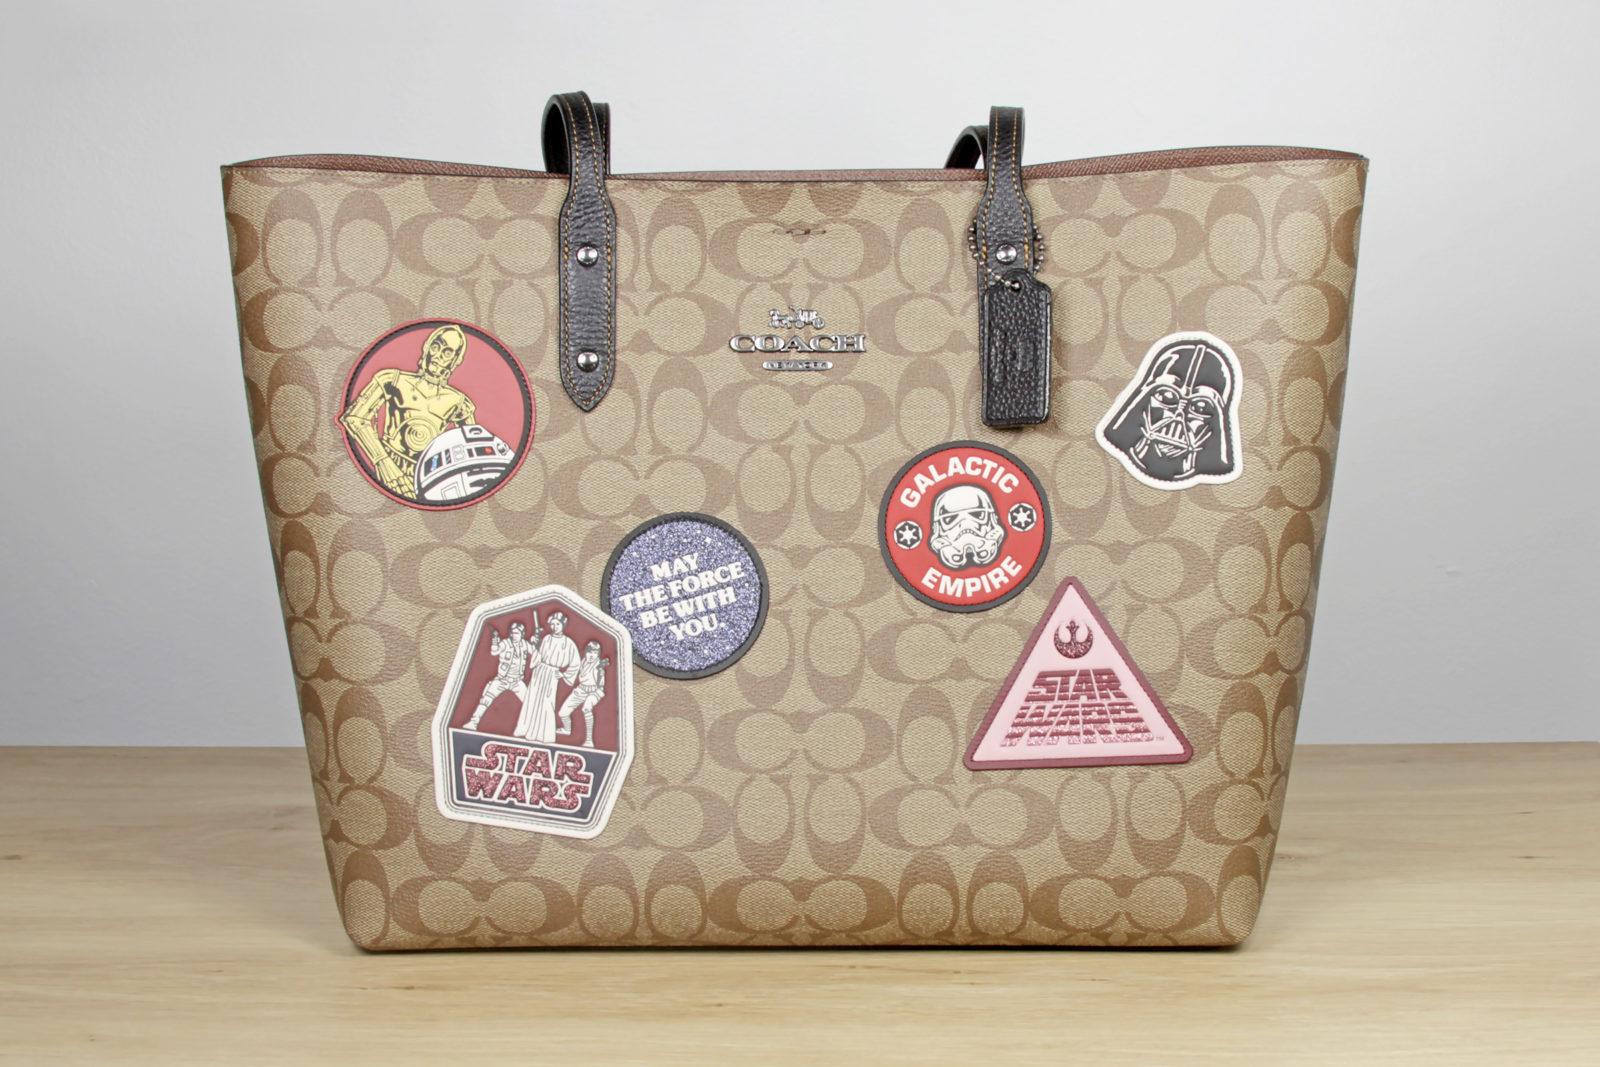 Coach x Star Wars tote bag